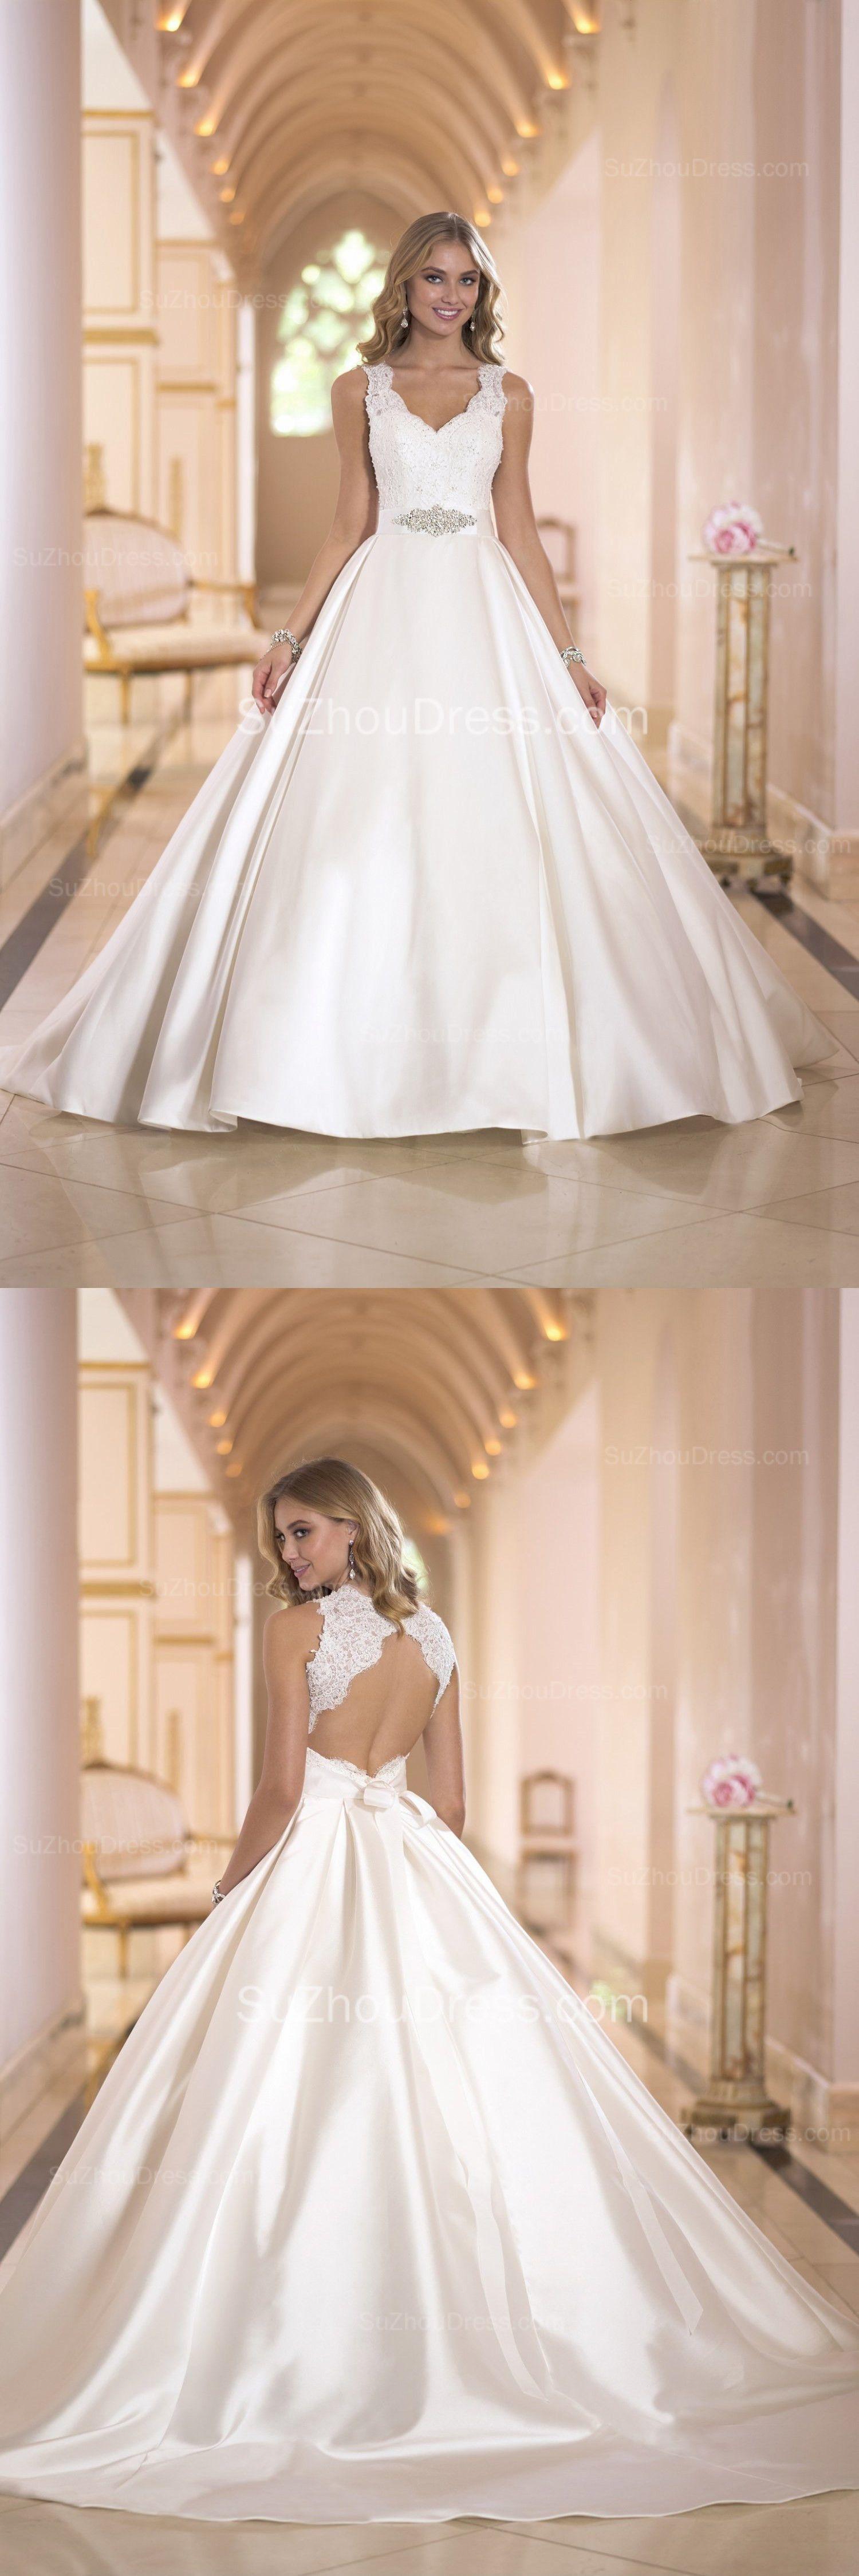 No lace wedding dress october 2018 ediliane cristianoedilia on Pinterest